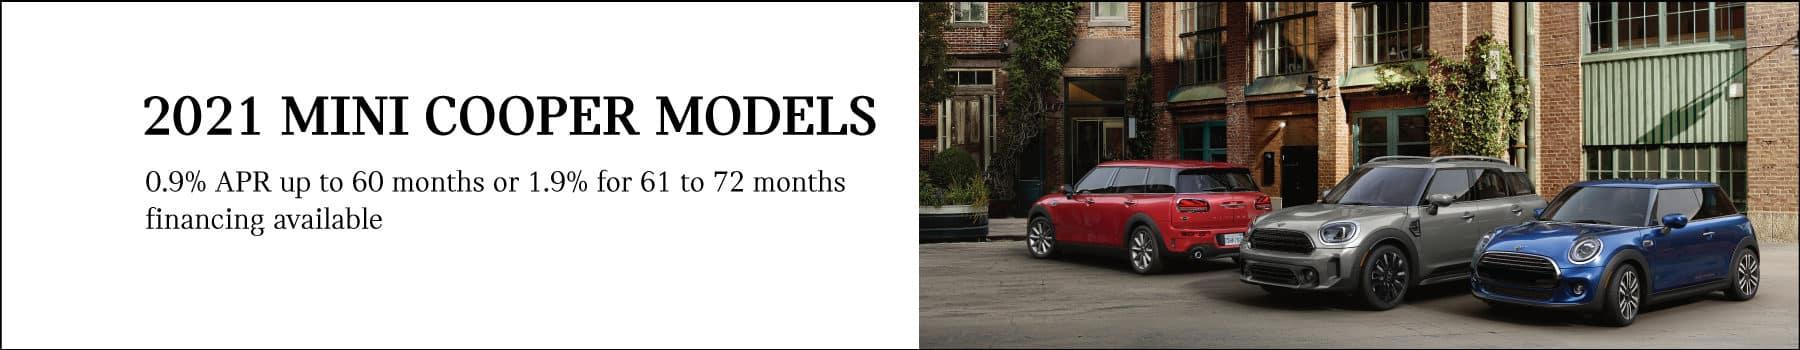 Monthly-Lease-Offer-Banner—2021-Models-1800×350